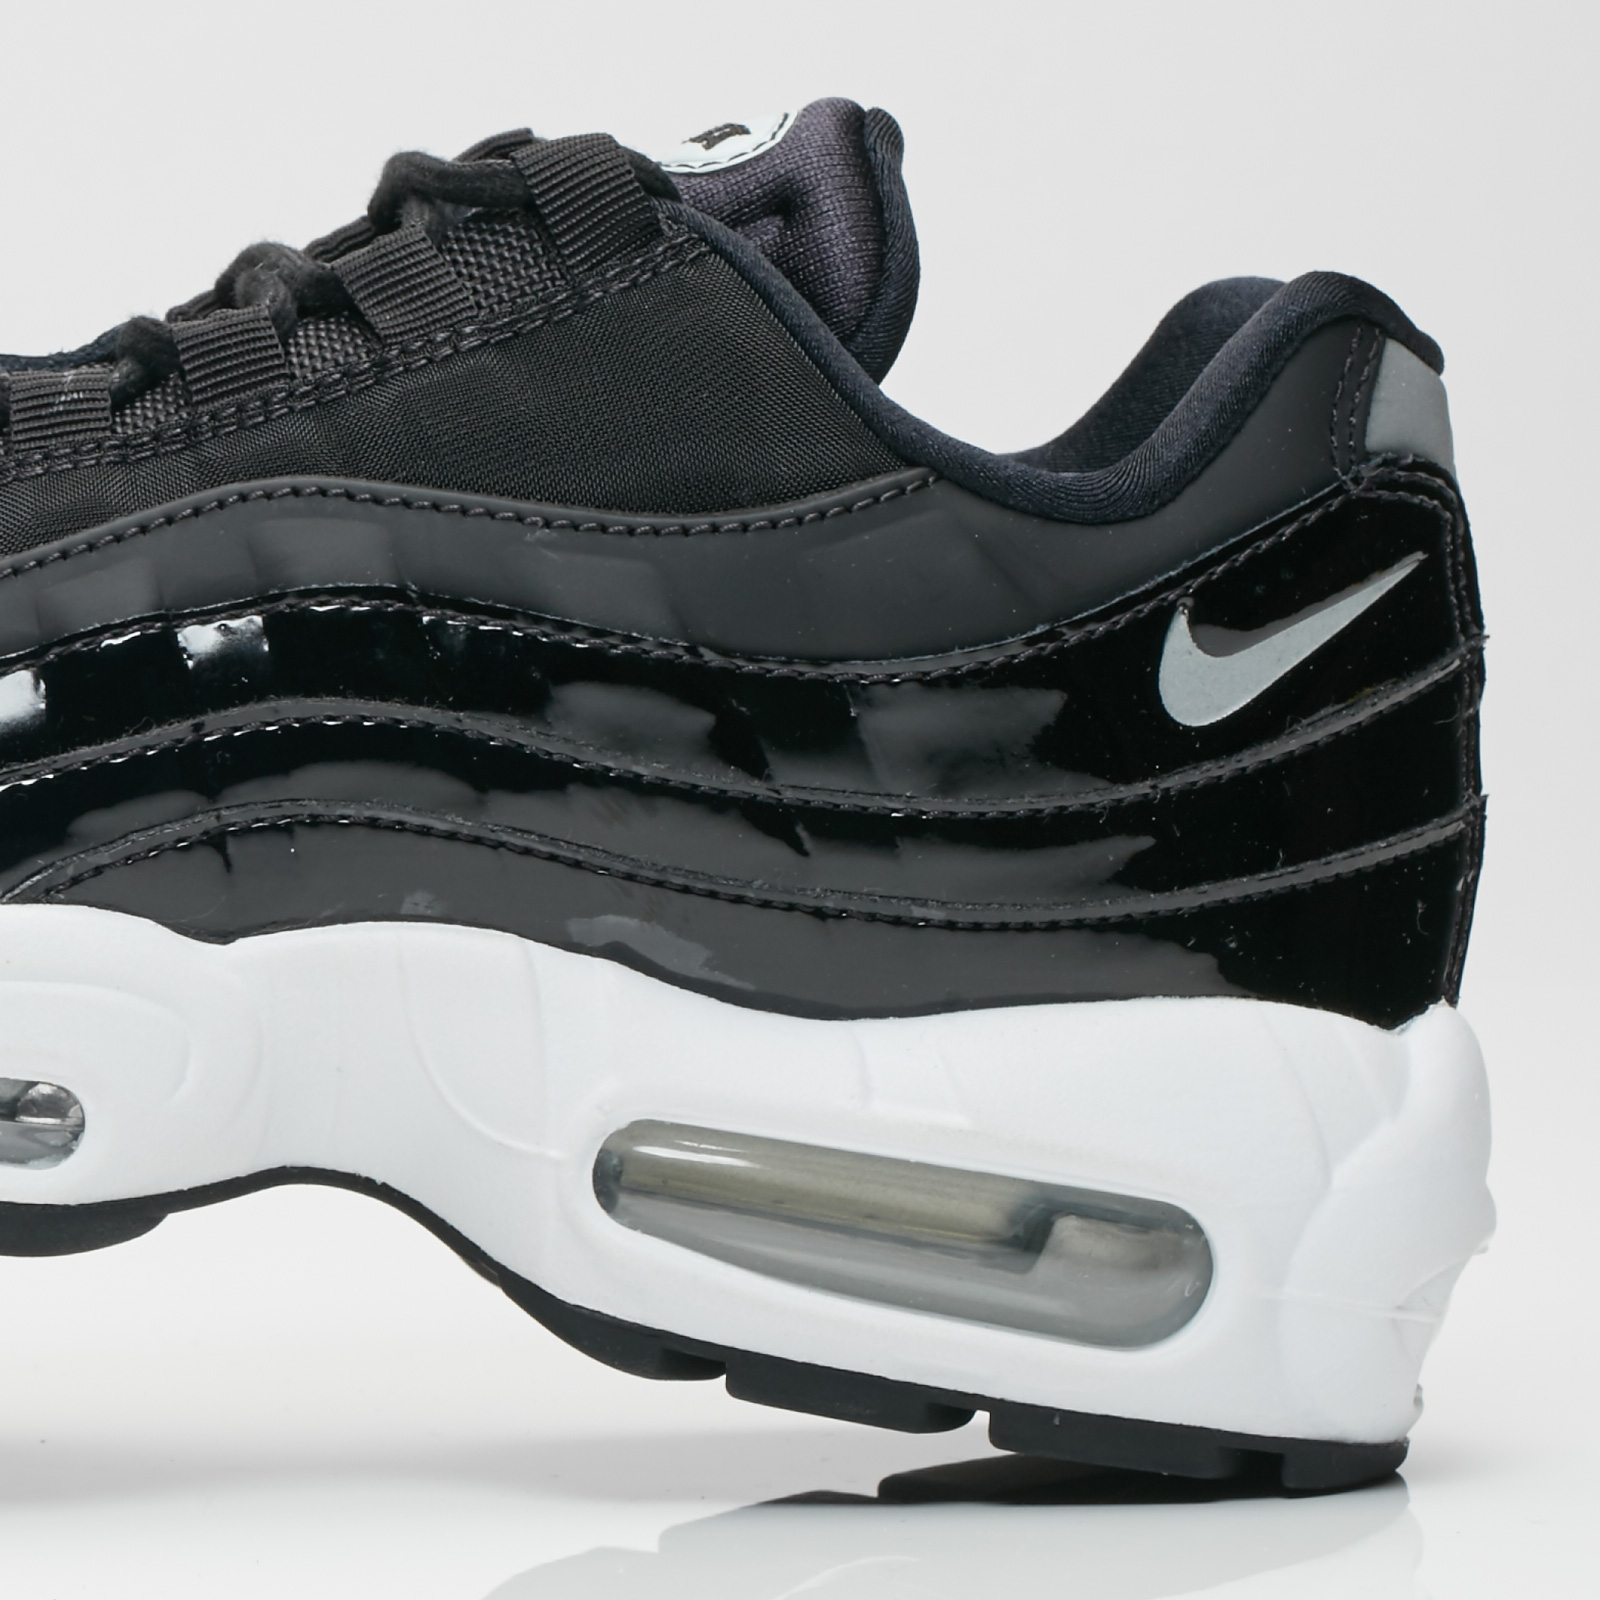 1f2713017e6 Nike Wmns Air Max 95 SE Premium - Ah8697-001 - Sneakersnstuff ...